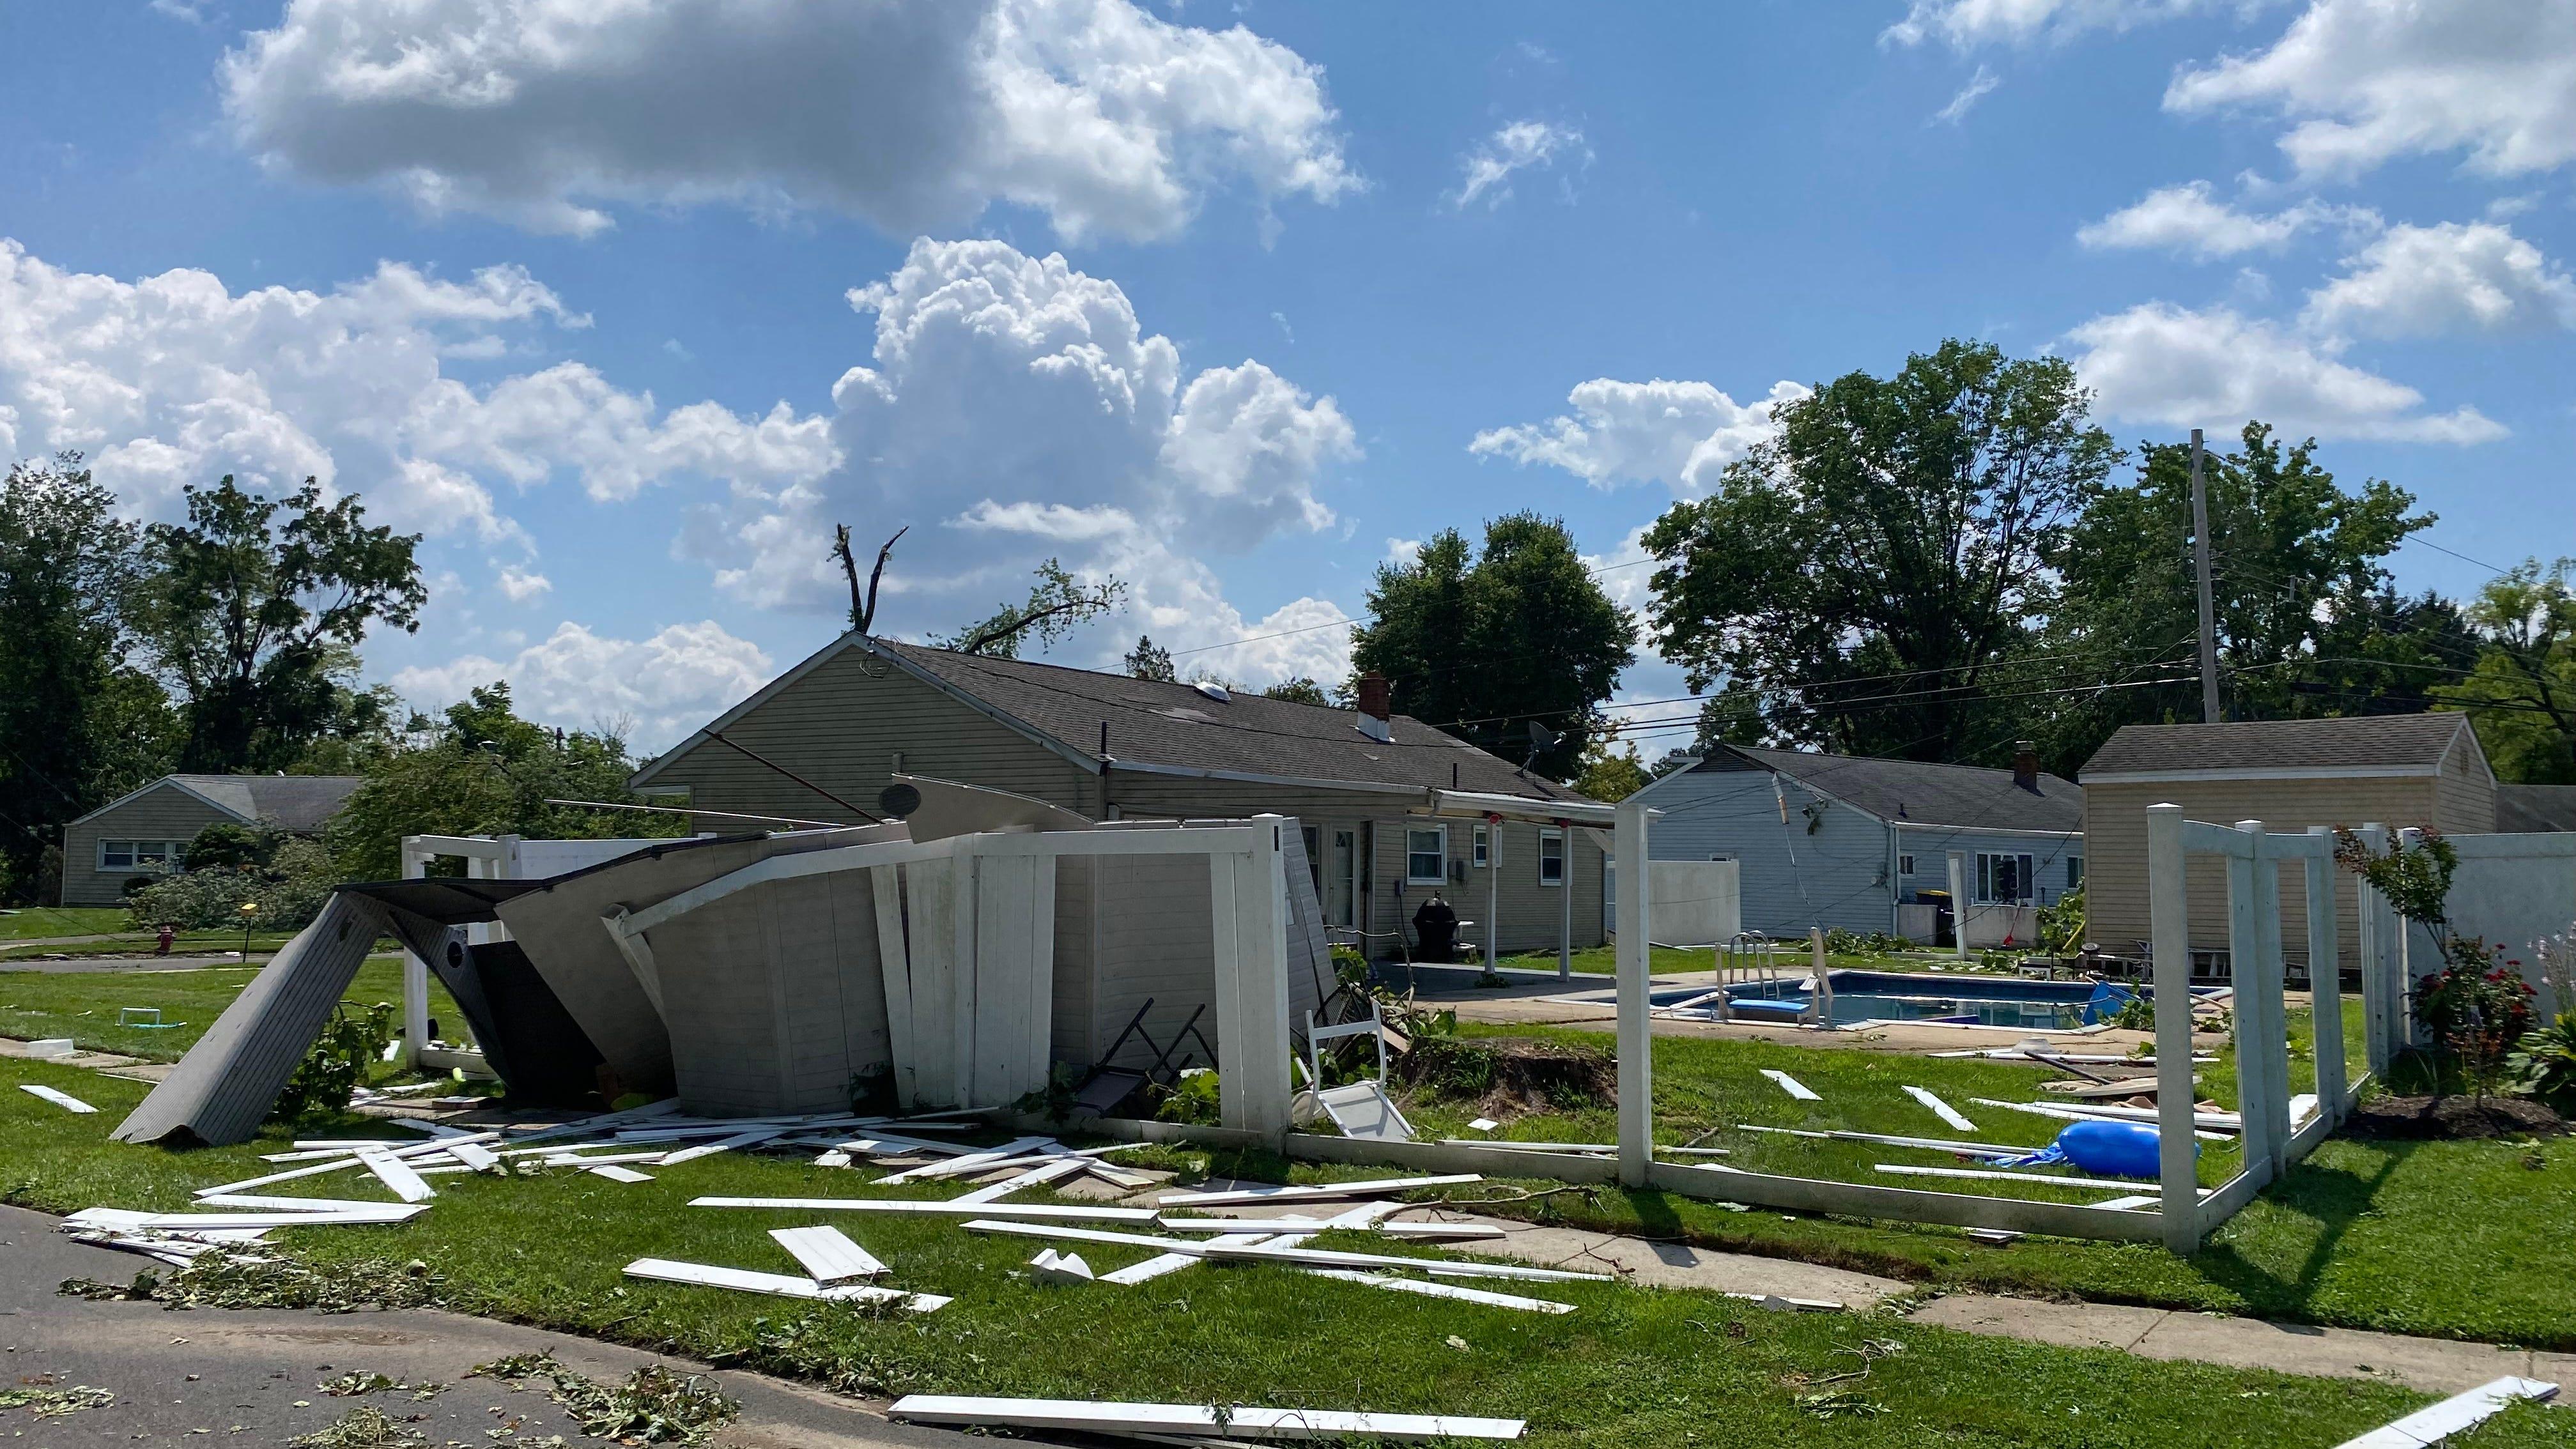 Bensalem residents in disbelief assess the damage from Trevose tornado